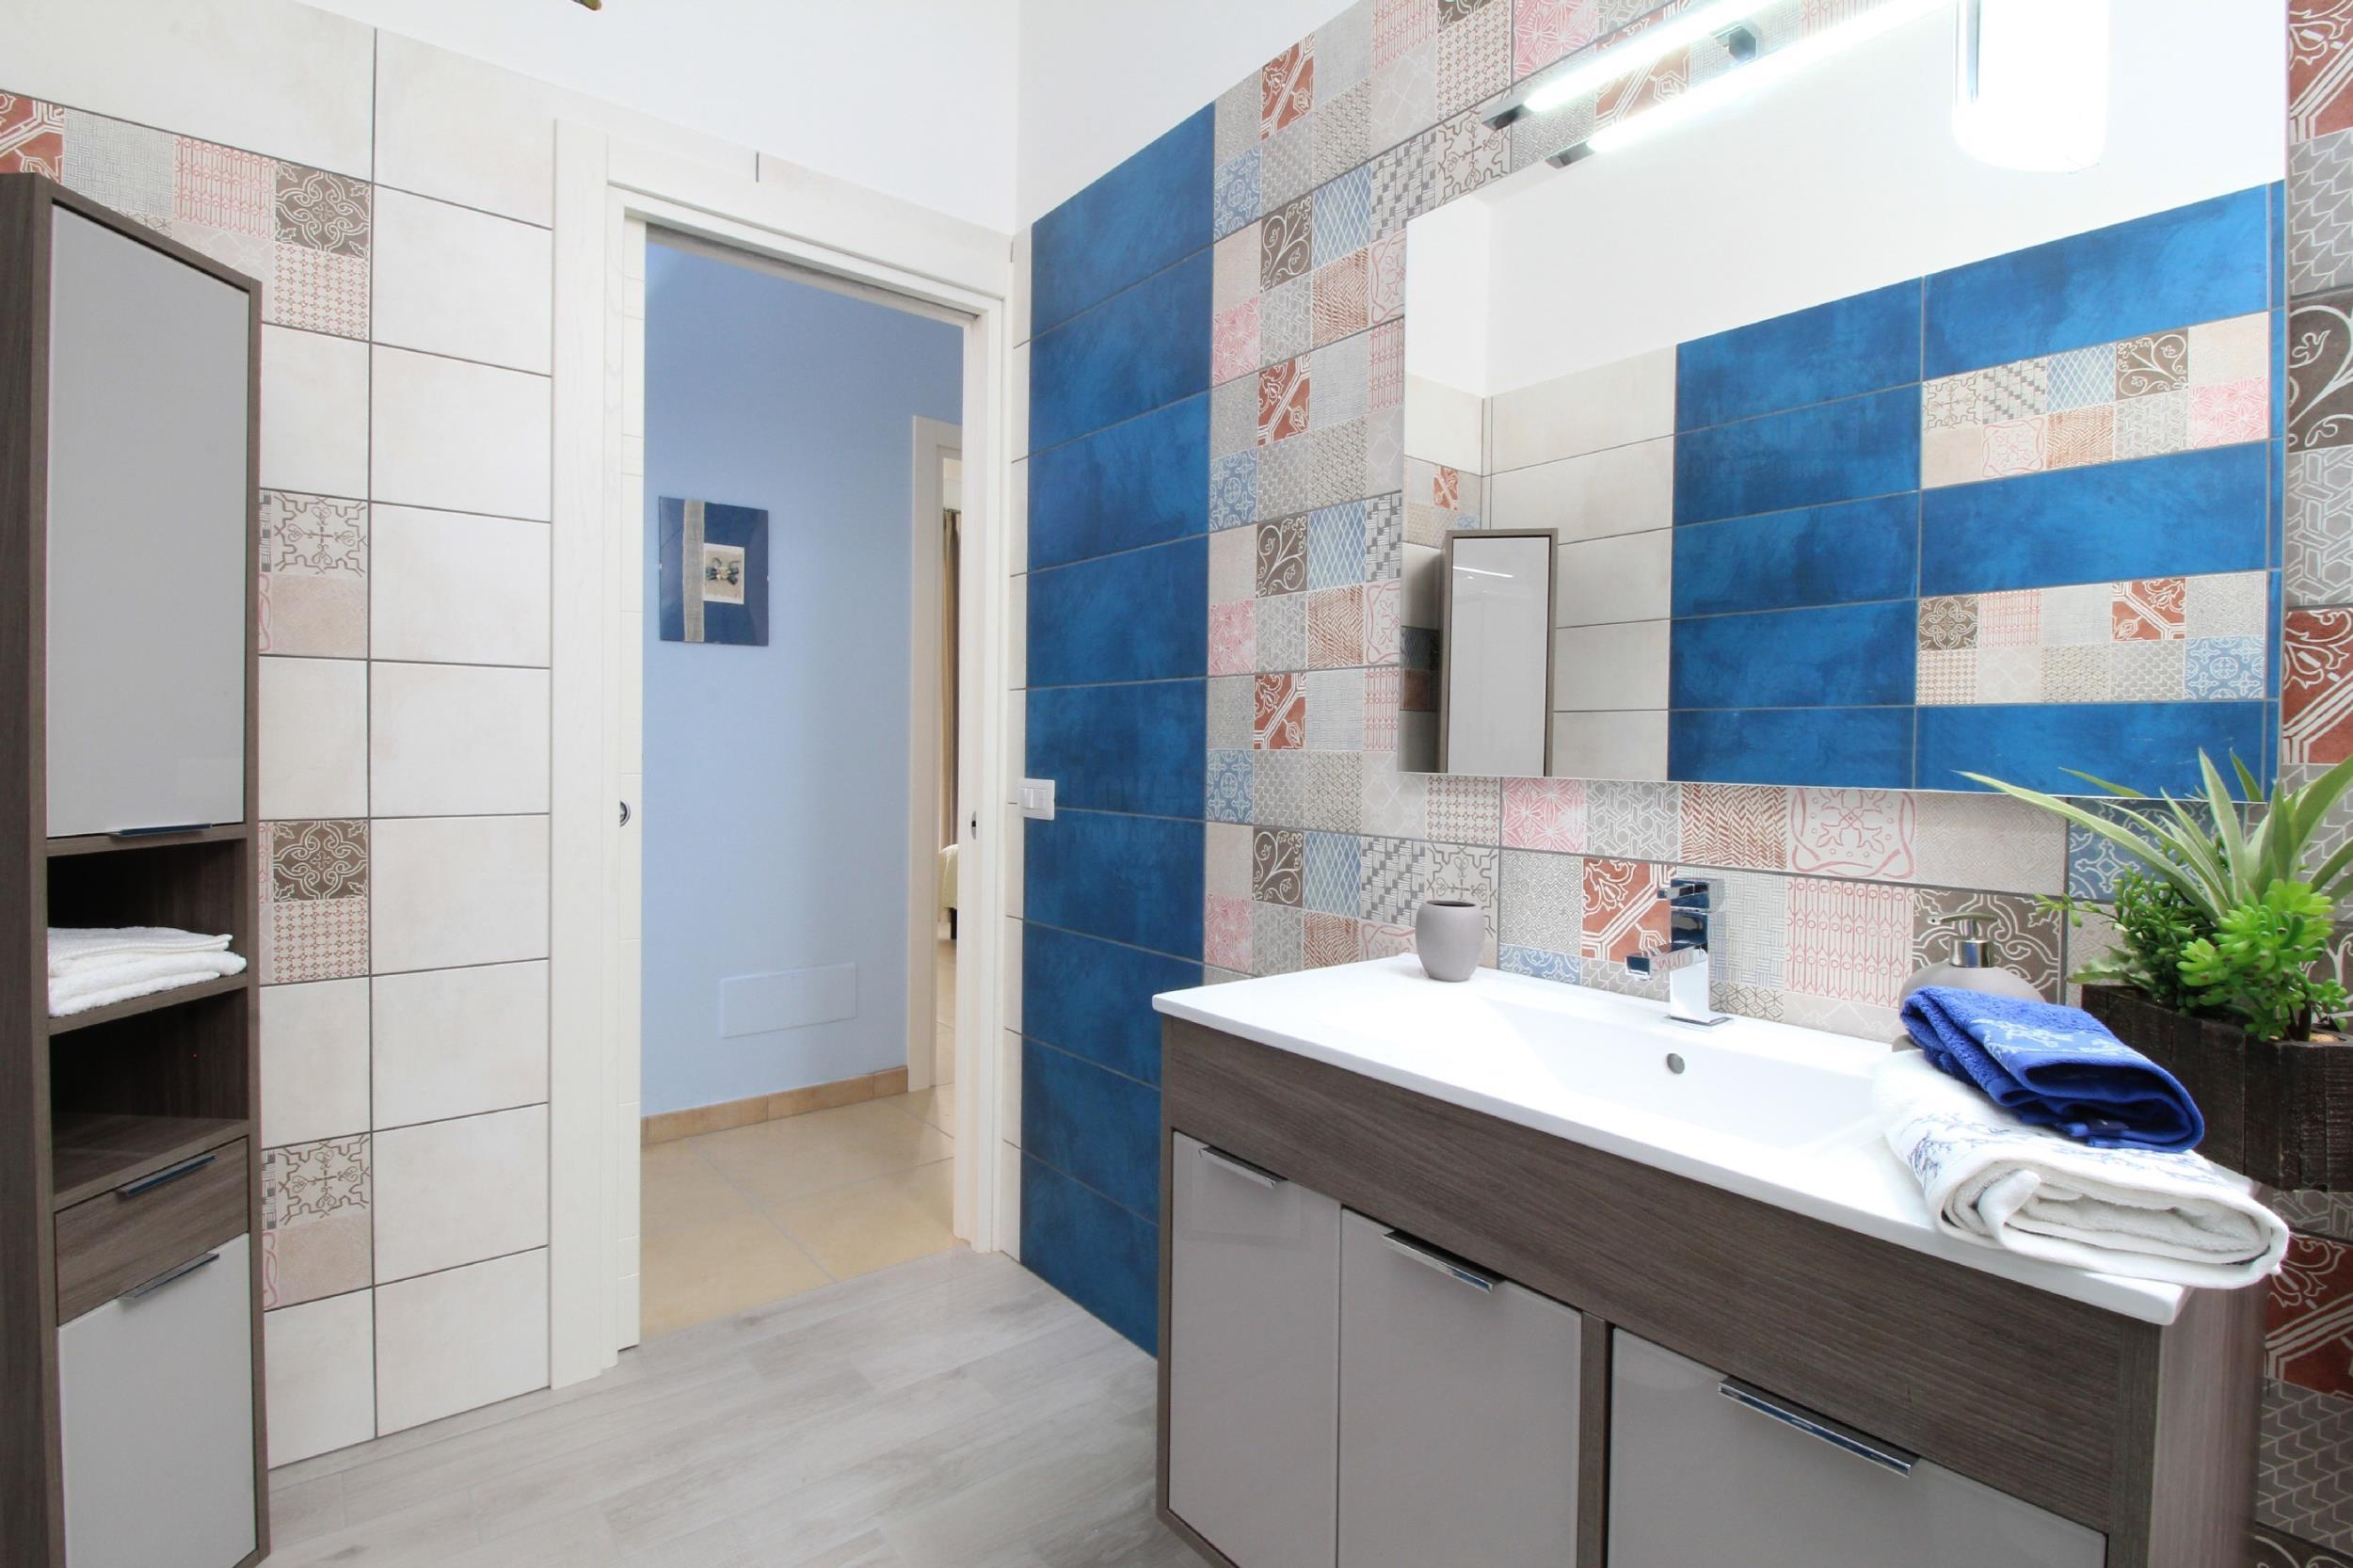 Apartment Elcisia luxe beach house photo 23457110